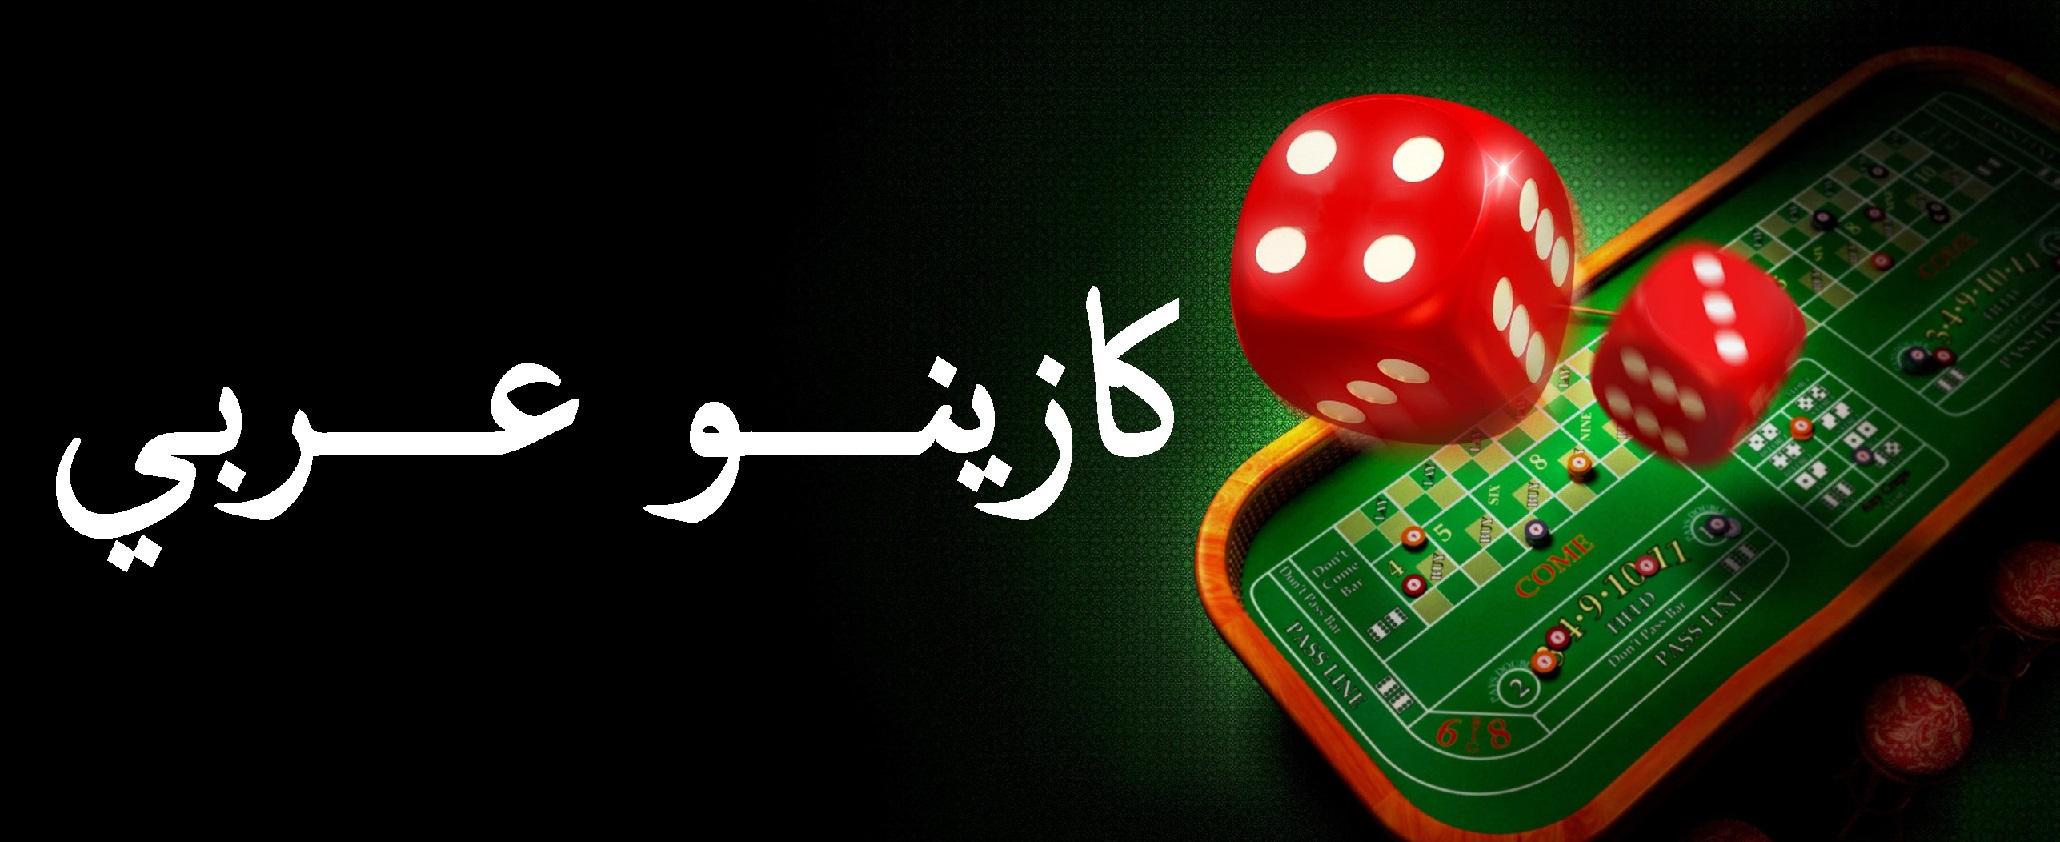 لعبة بوكر 564172